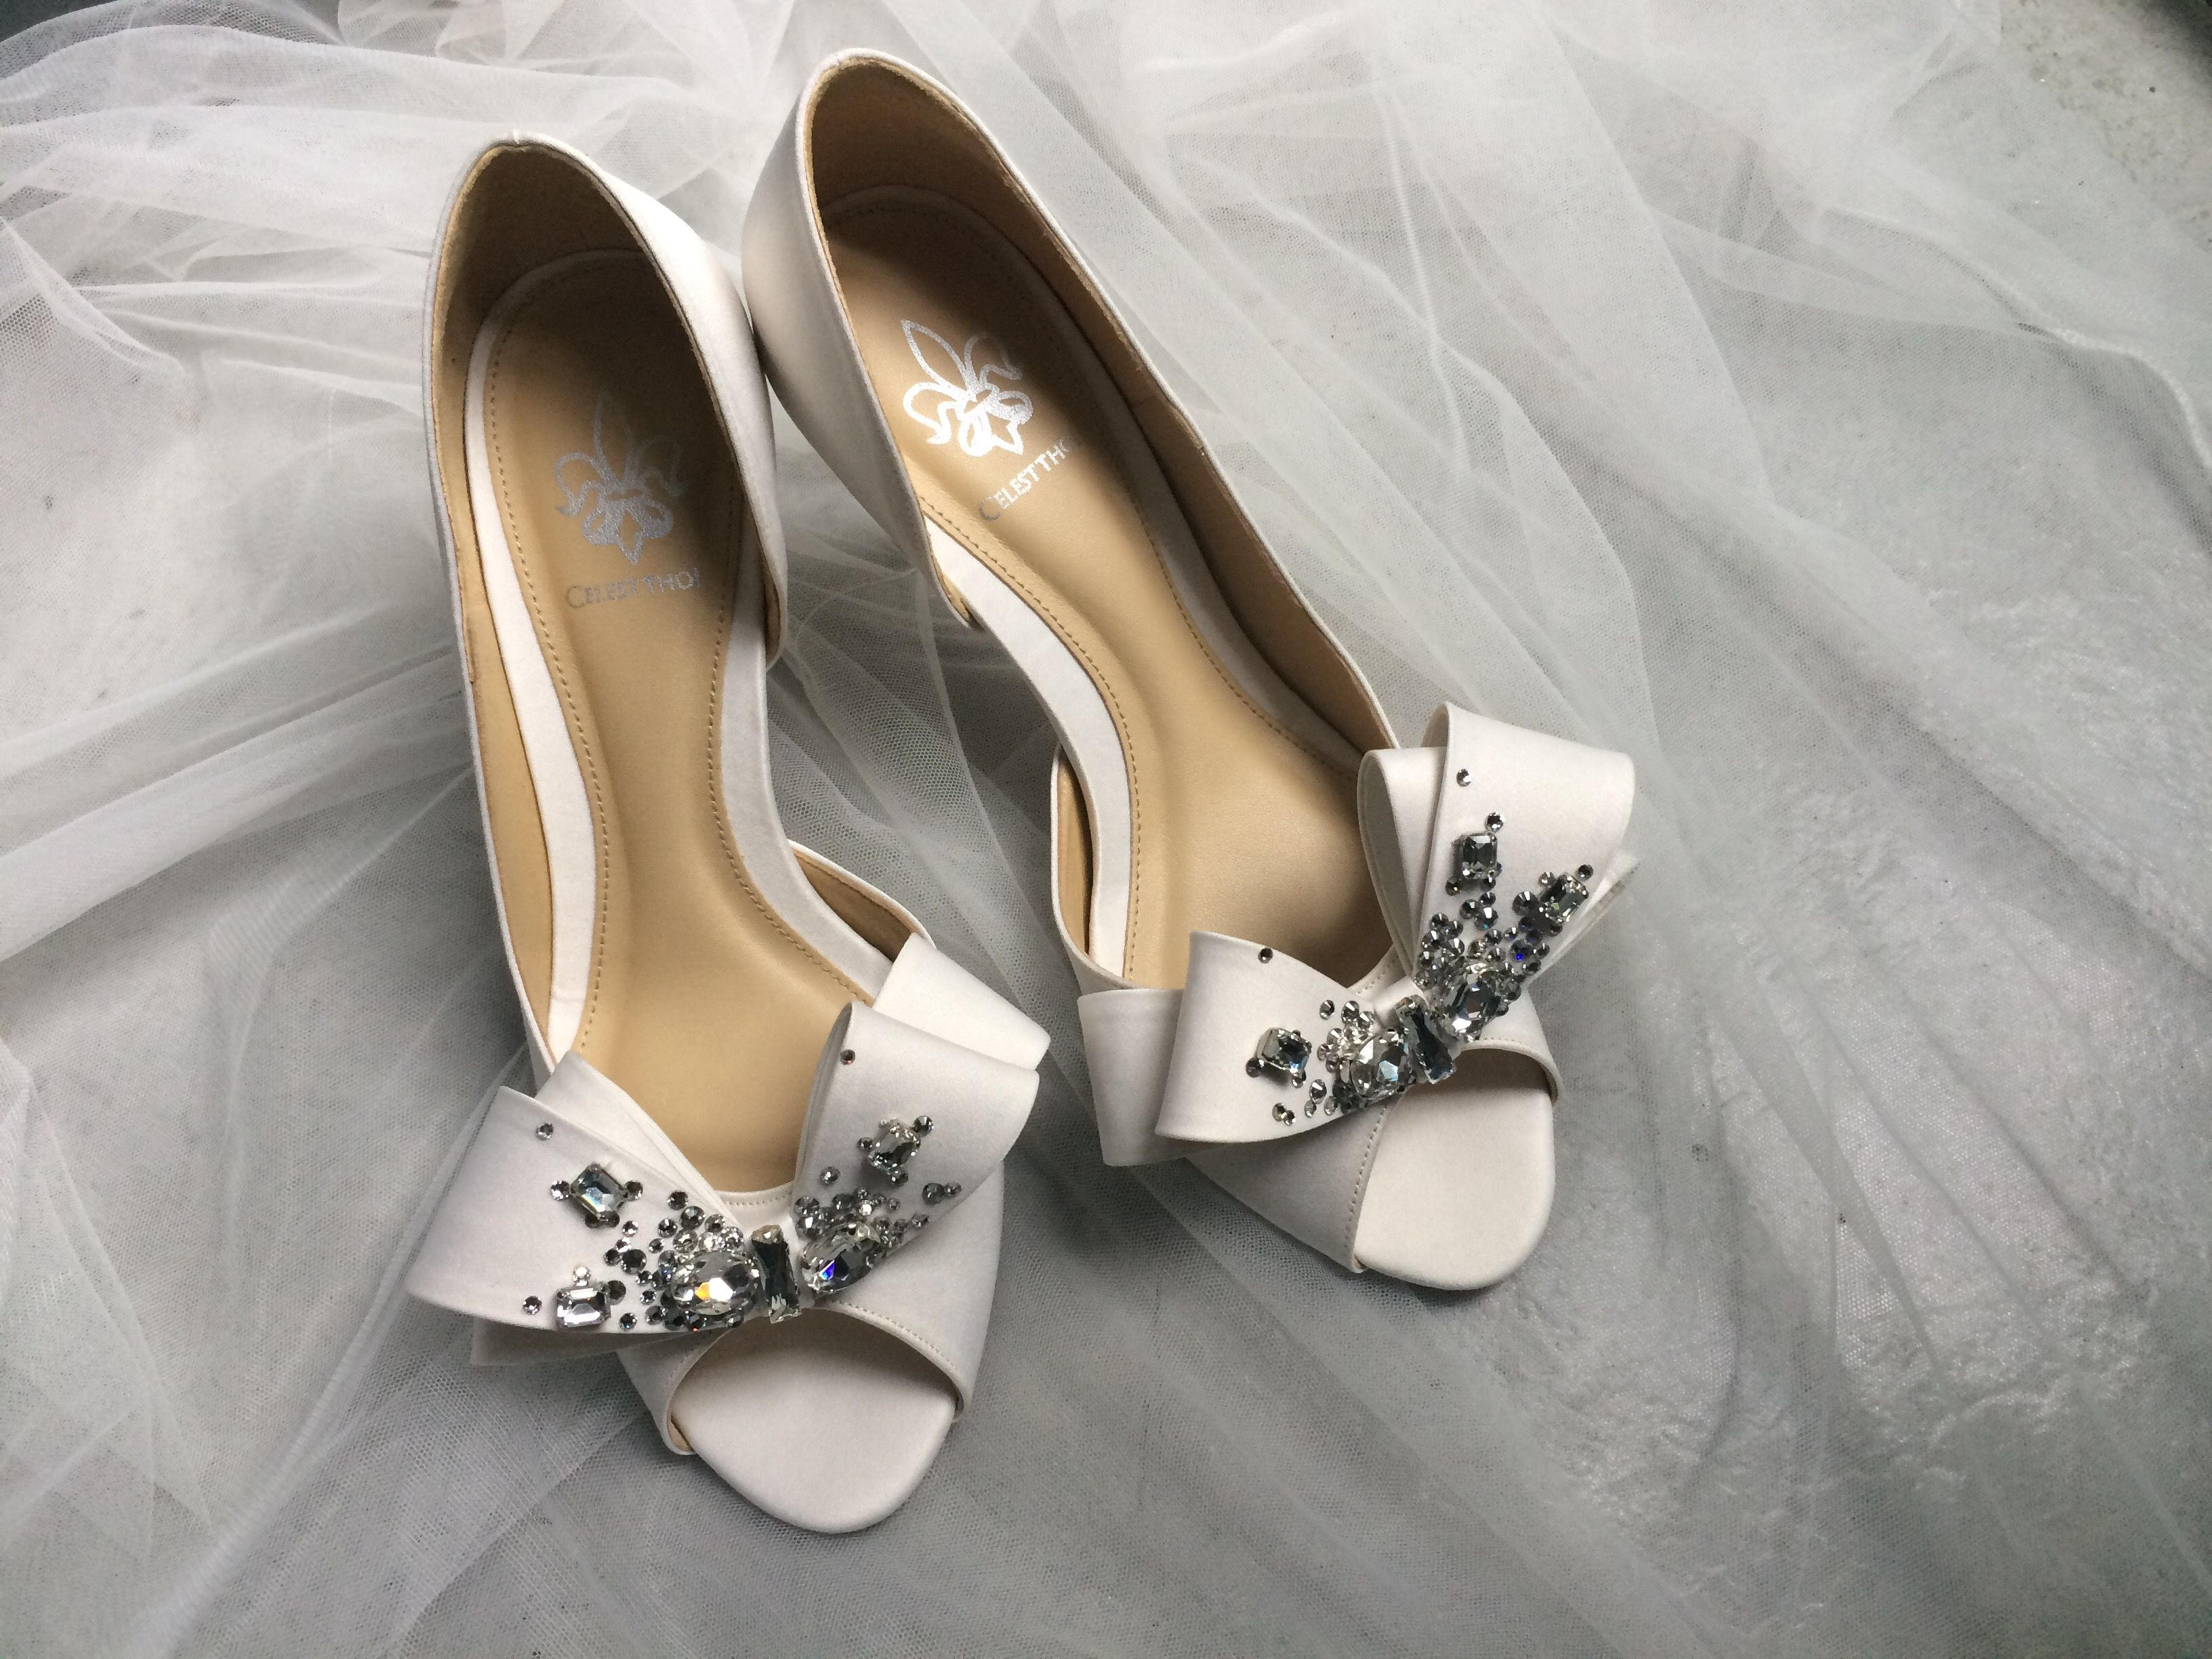 Celest Thoi bespoke wedding shoes with Swarovski crystal